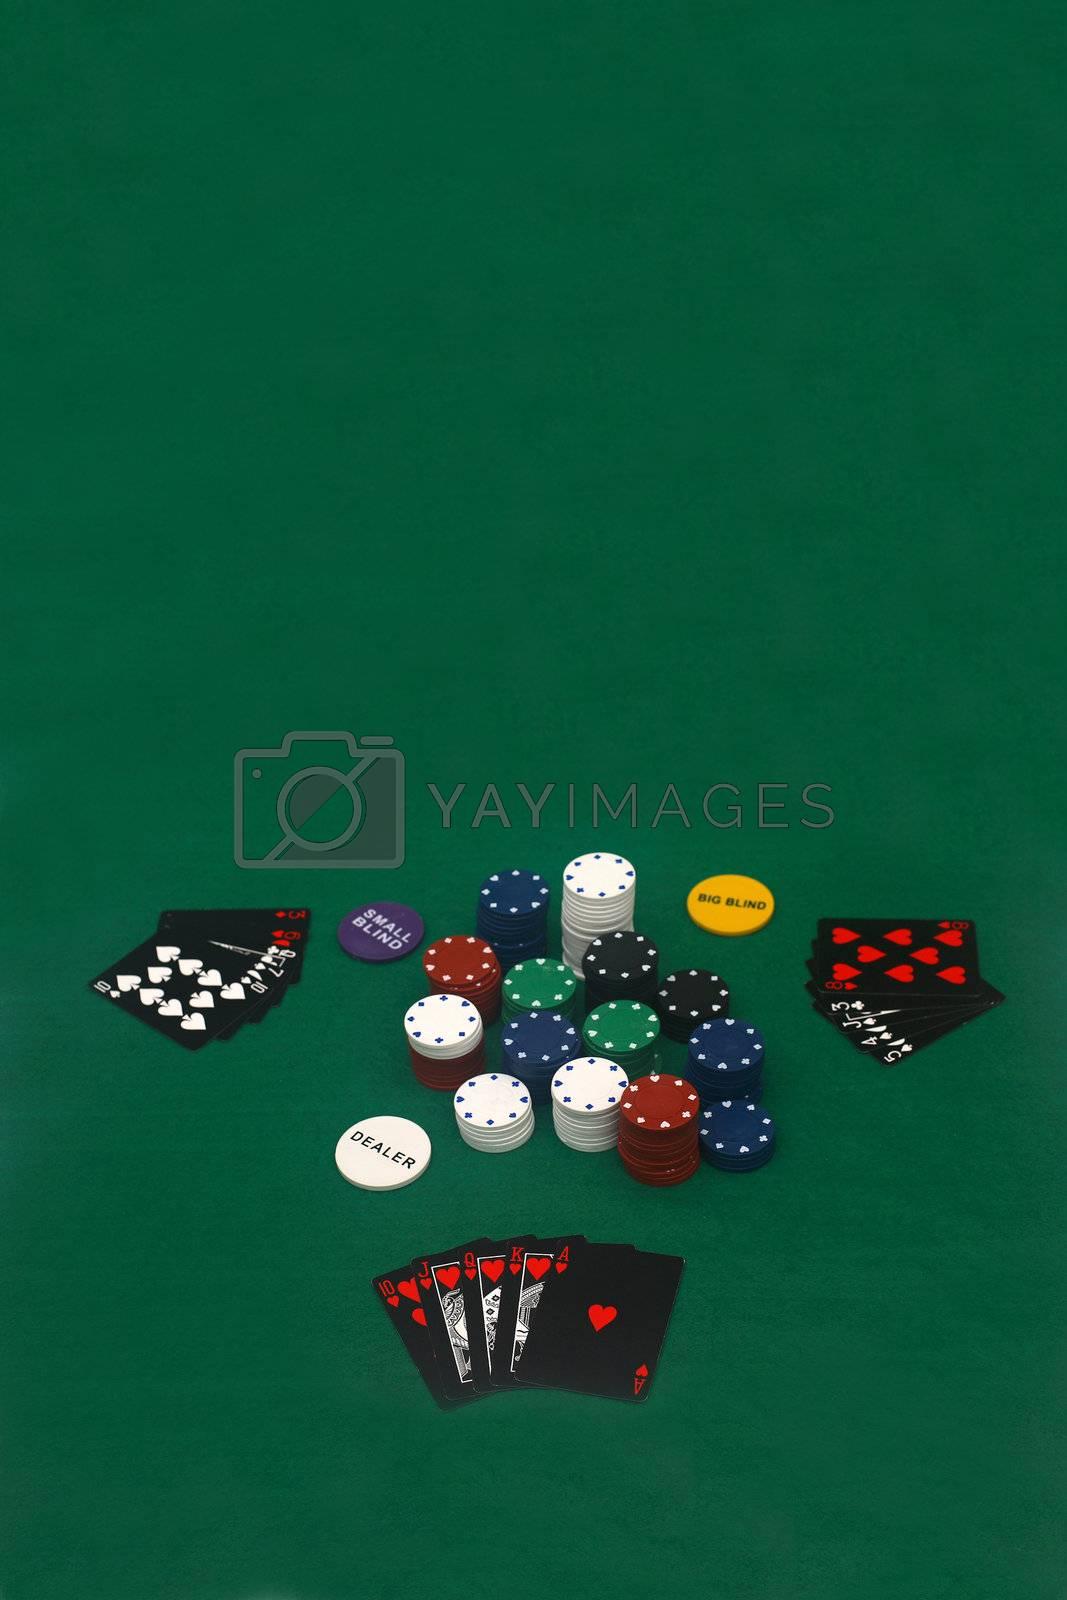 Poker Game by Daniel_Wiedemann